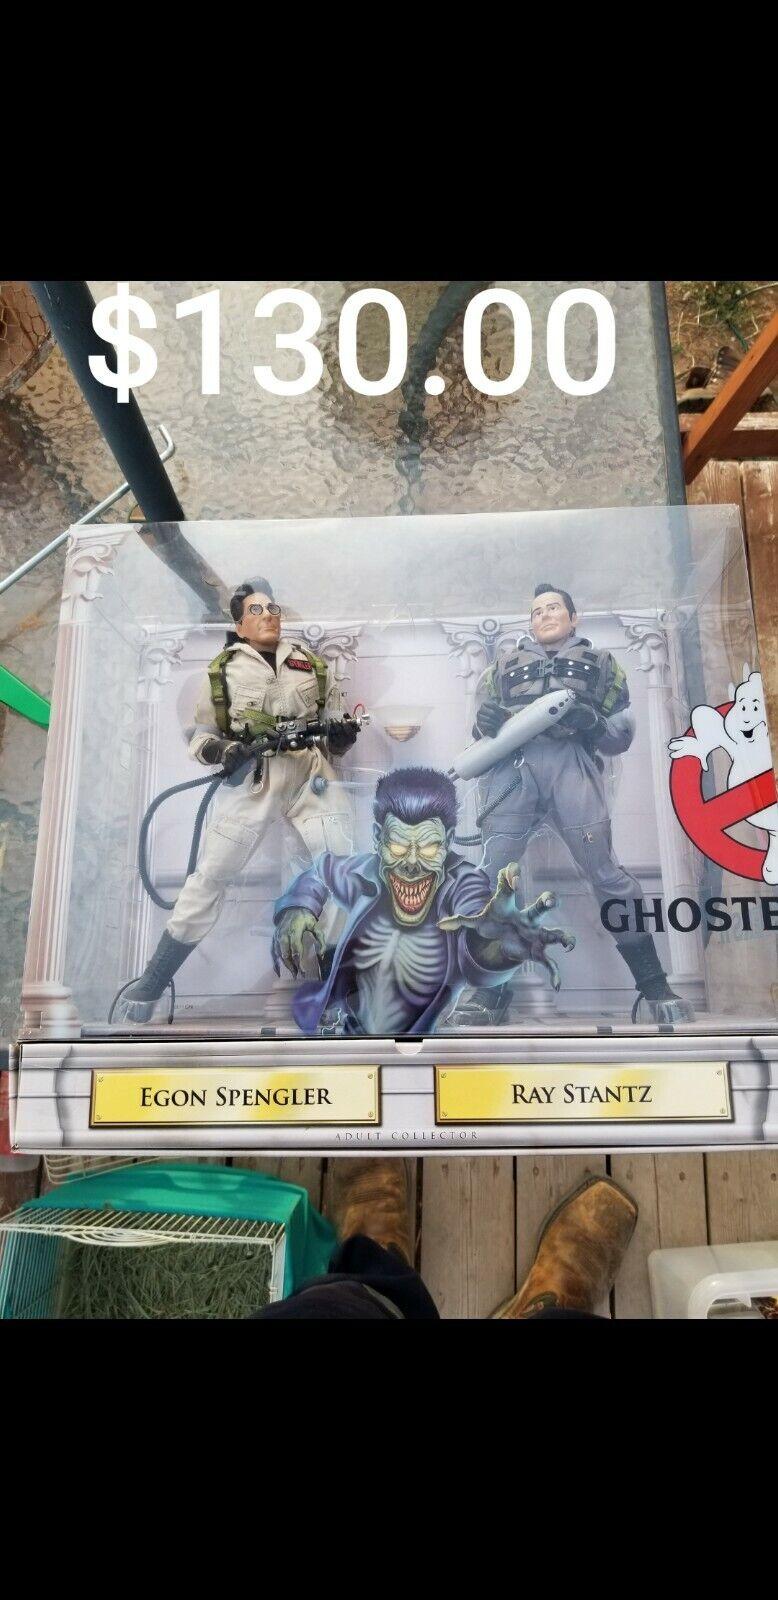 Mattel Ghostbusters courtroom Battle EGON SPENGLER Action Figure avec Mailer Box